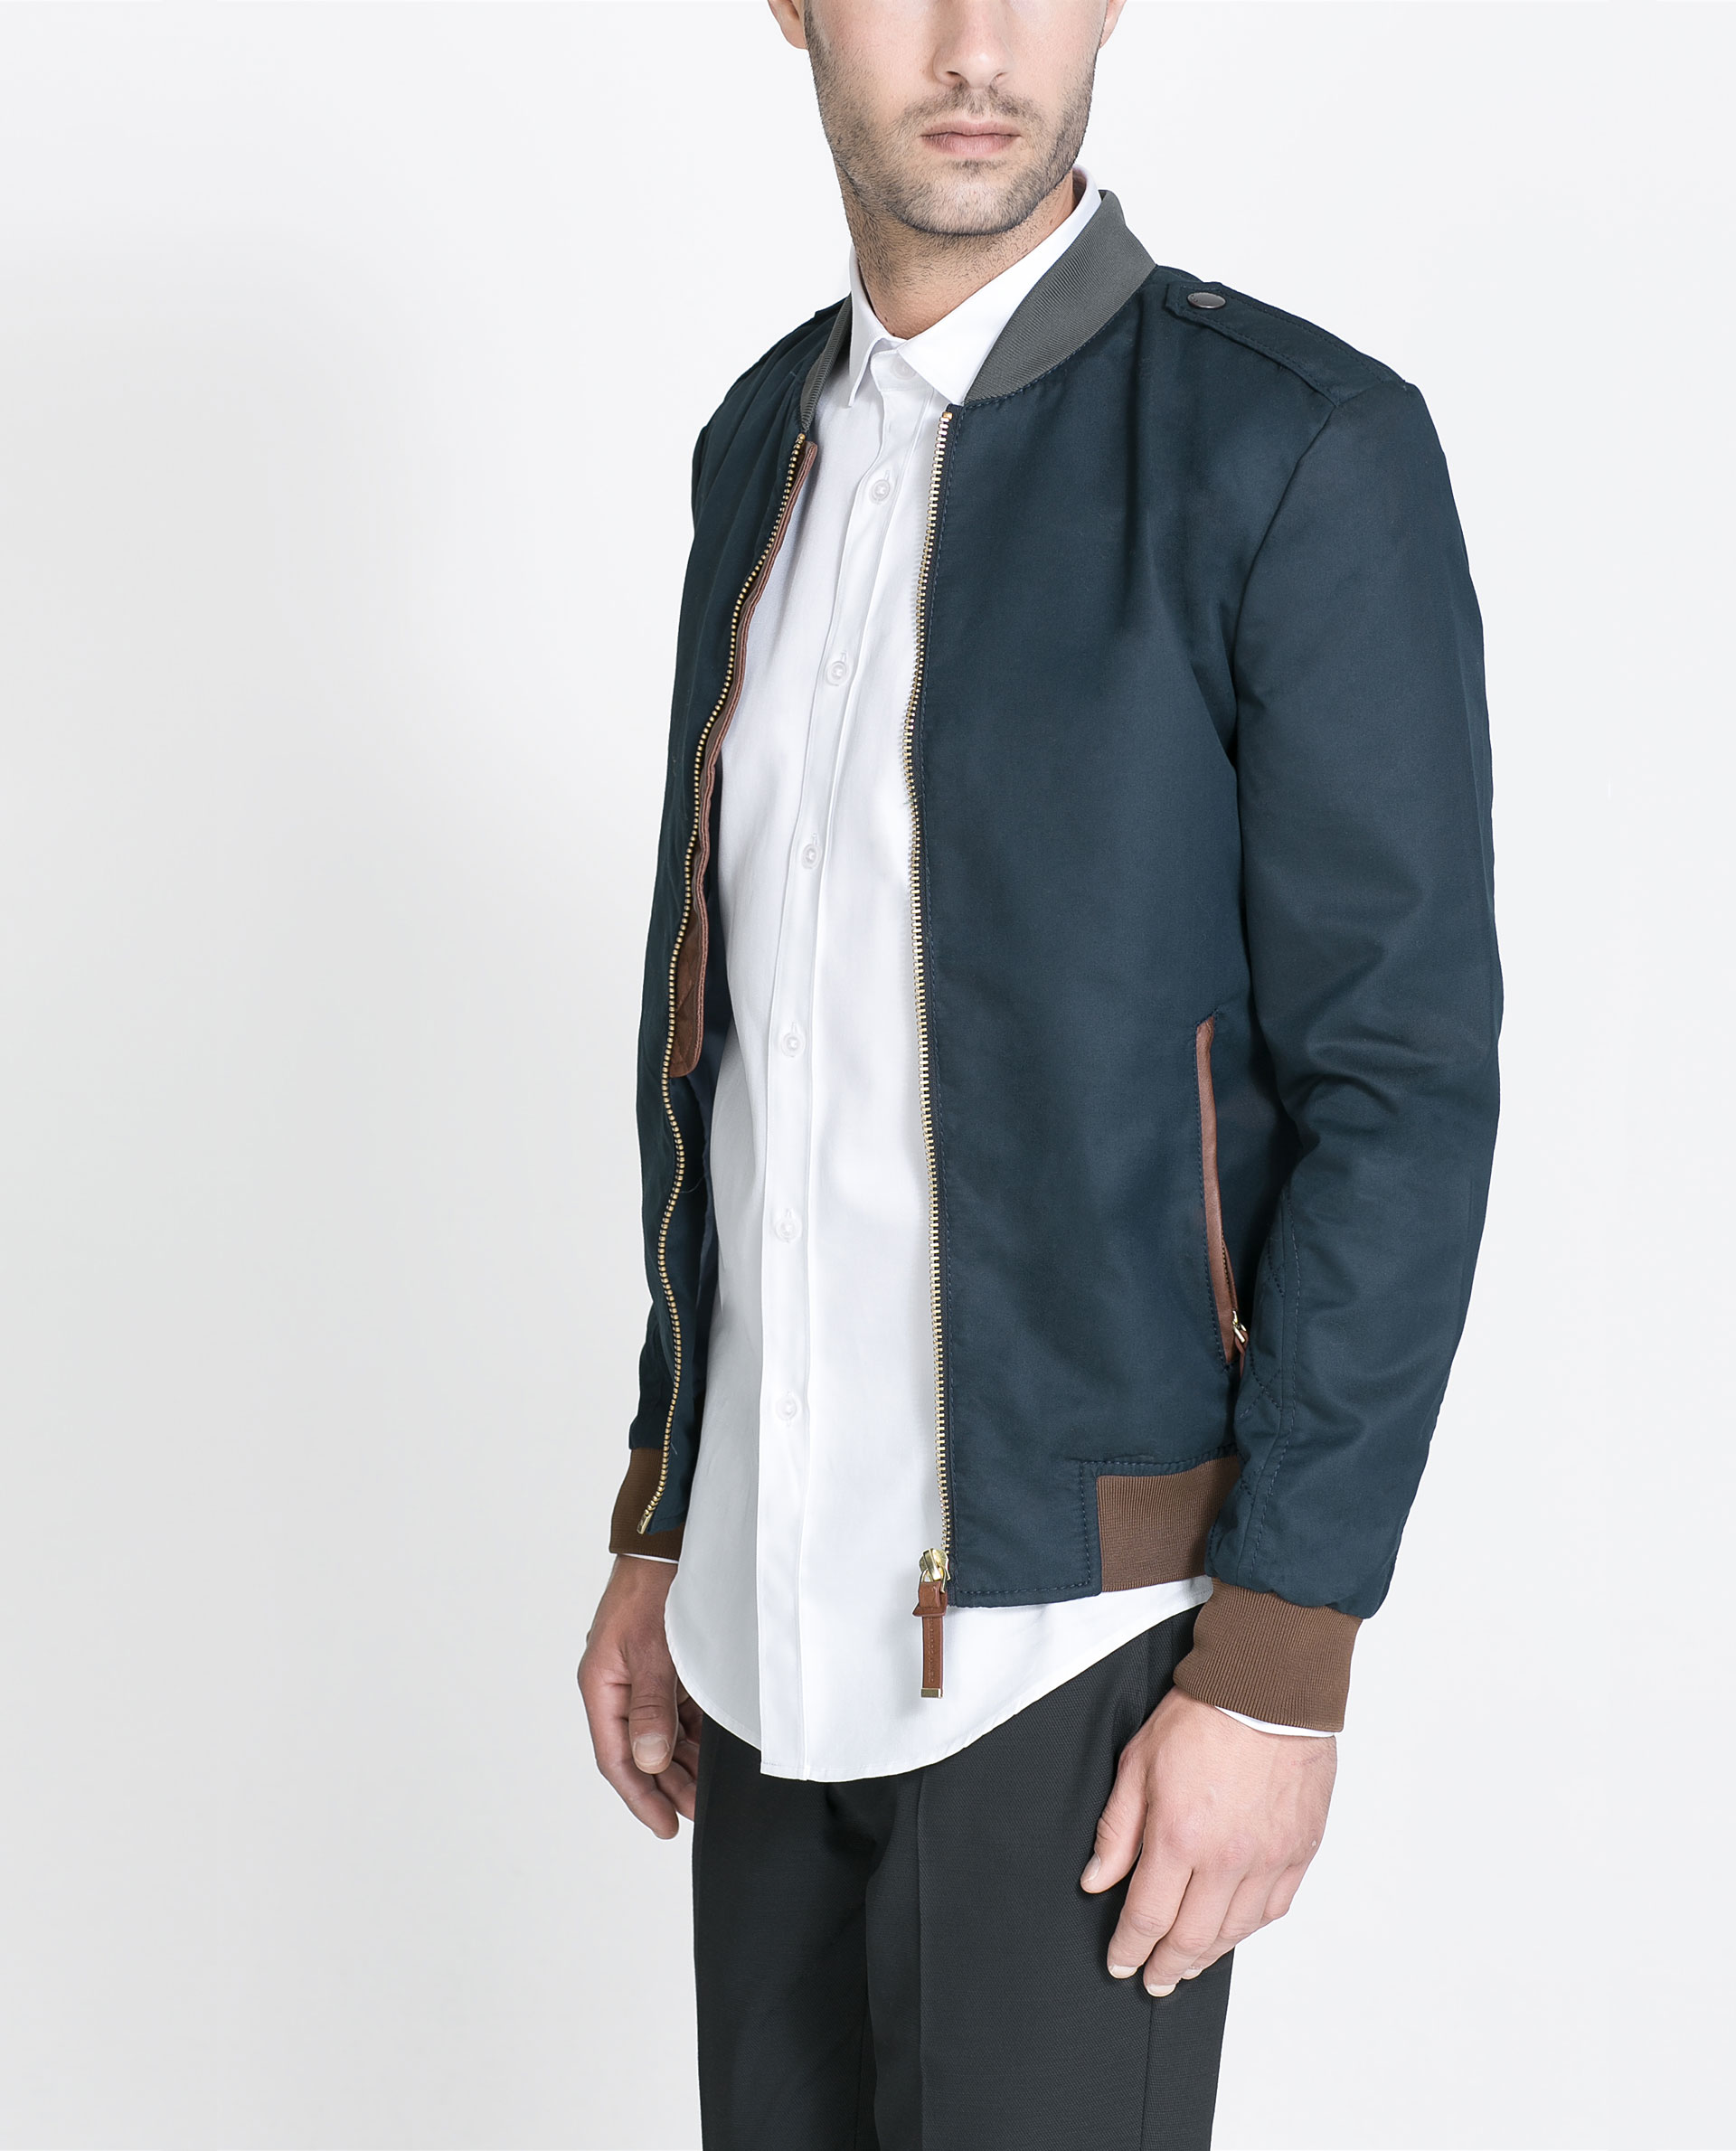 Zara Combination Bomber Jacket In Blue For Men | Lyst